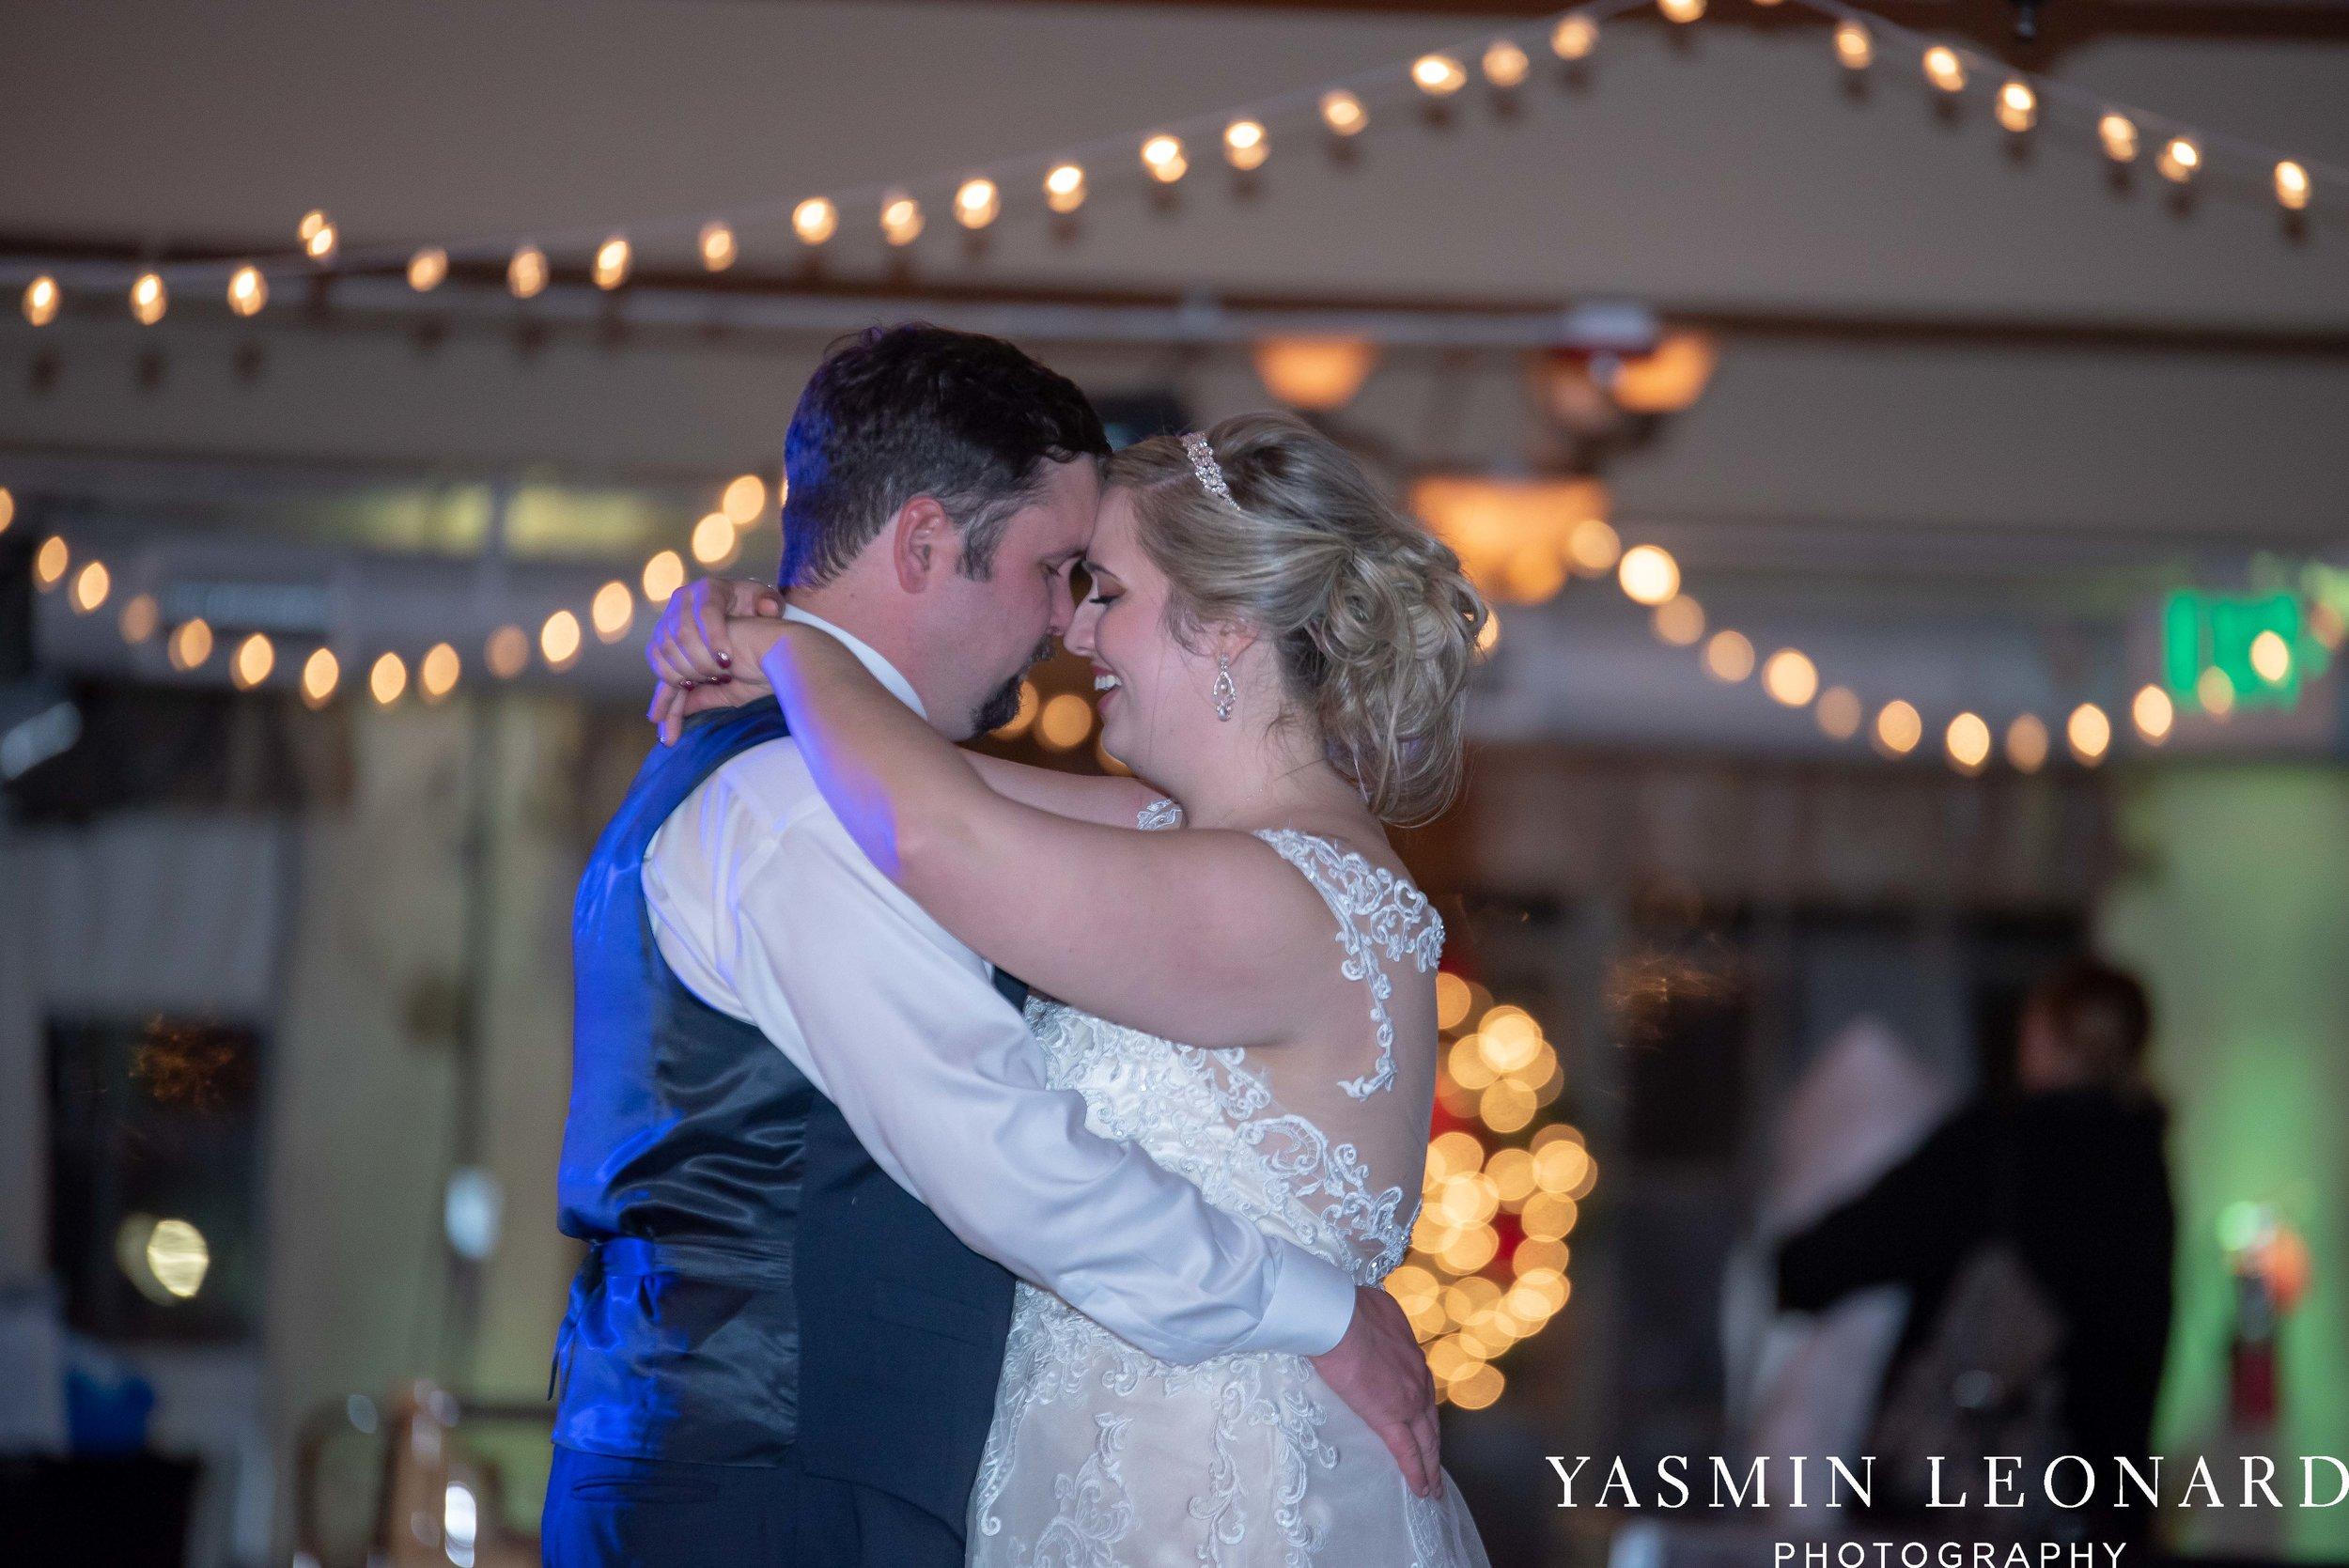 Rebekah and Matt - 105 Worth Event Centre - Yasmin Leonard Photography - Asheboro Wedding - NC Wedding - High Point Weddings - Triad Weddings - Winter Wedding-89.jpg